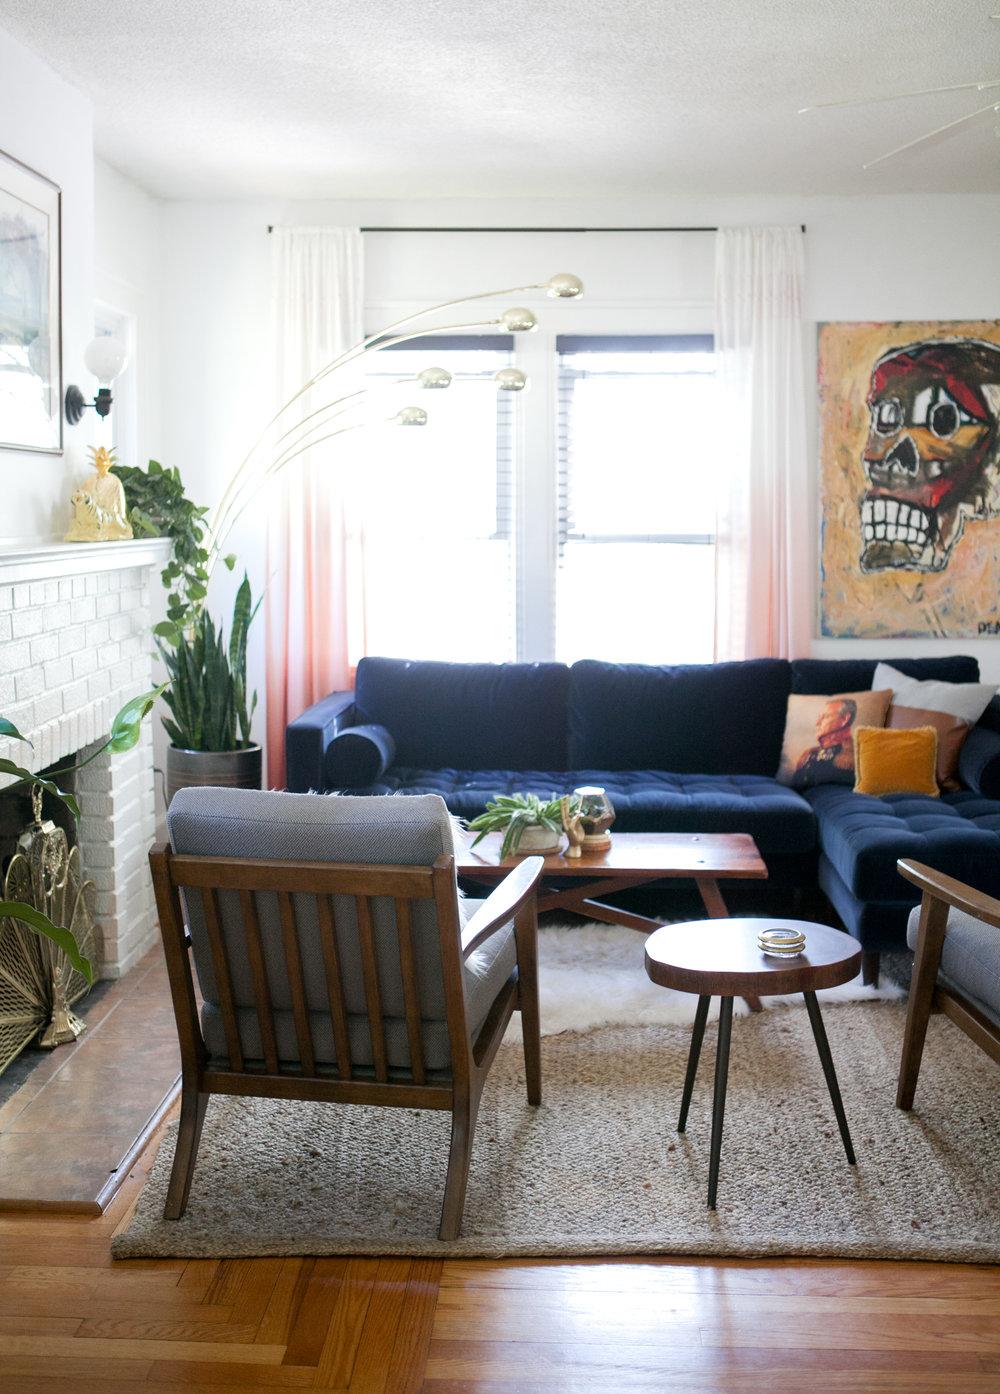 09_Design-Sponge-Jessica-Brigham-Living-Room.jpg